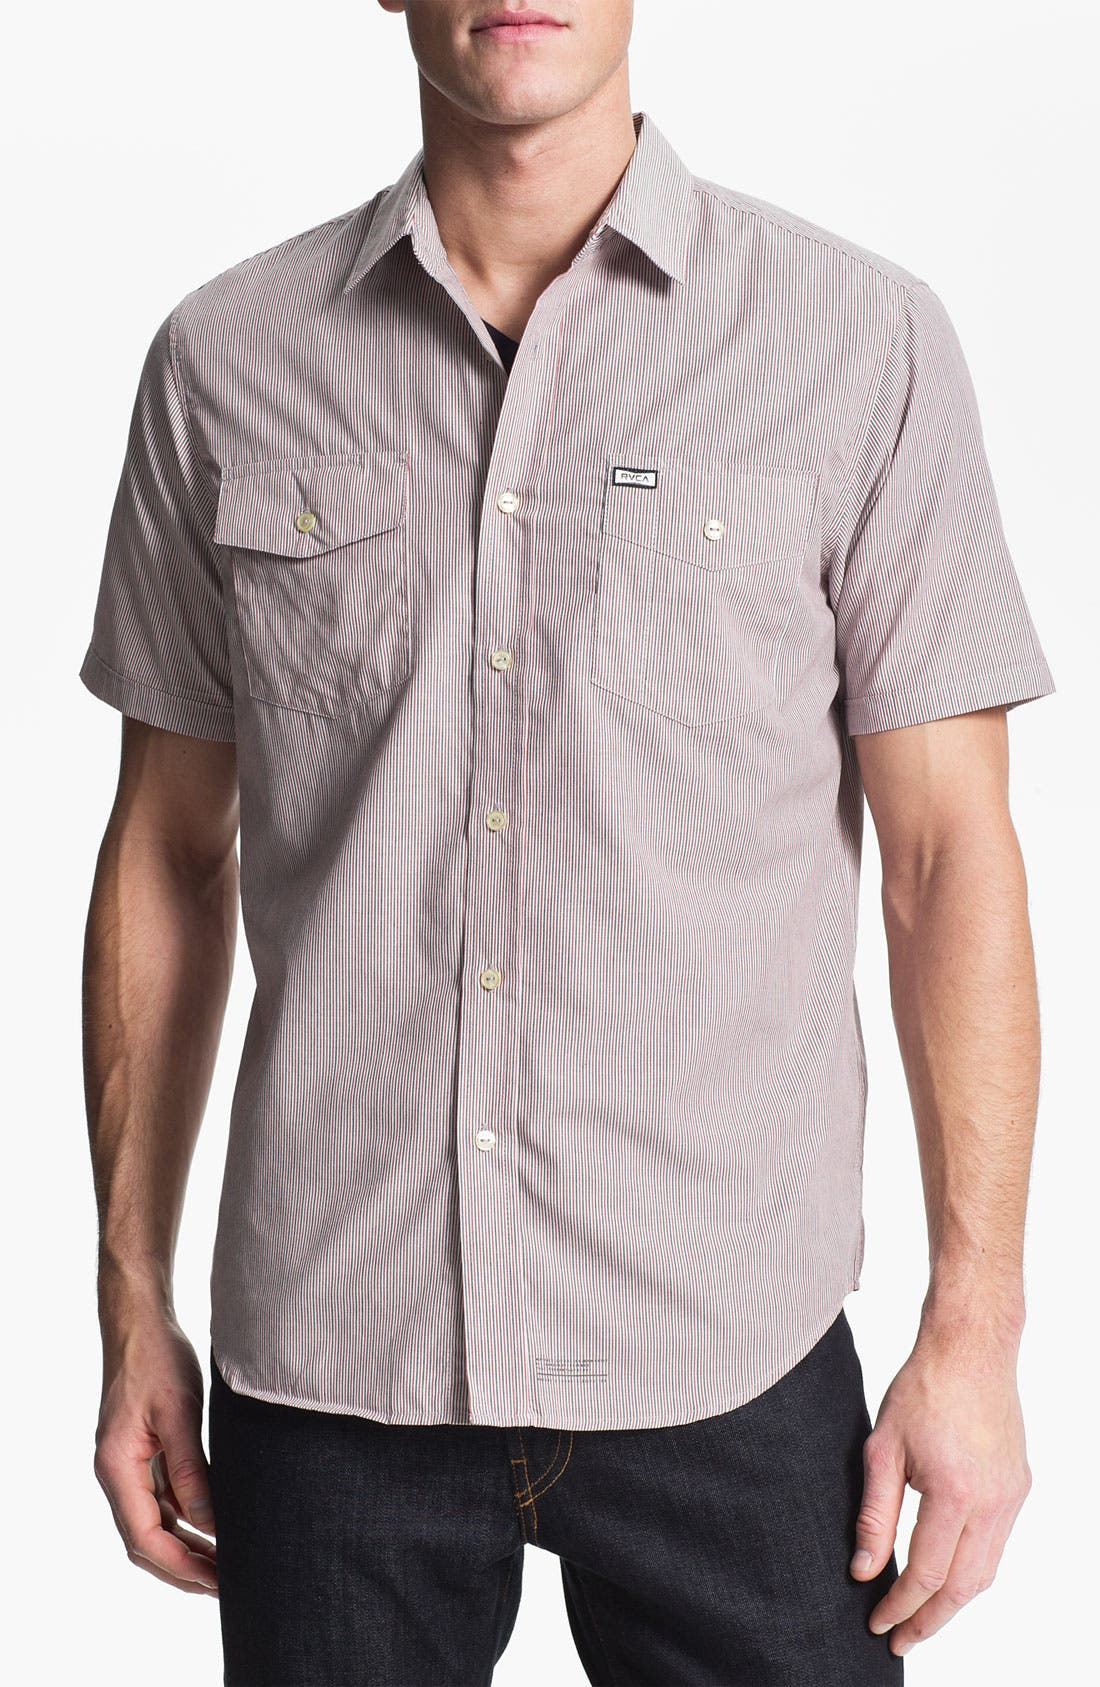 Main Image - RVCA 'Creedance' Stripe Woven Shirt